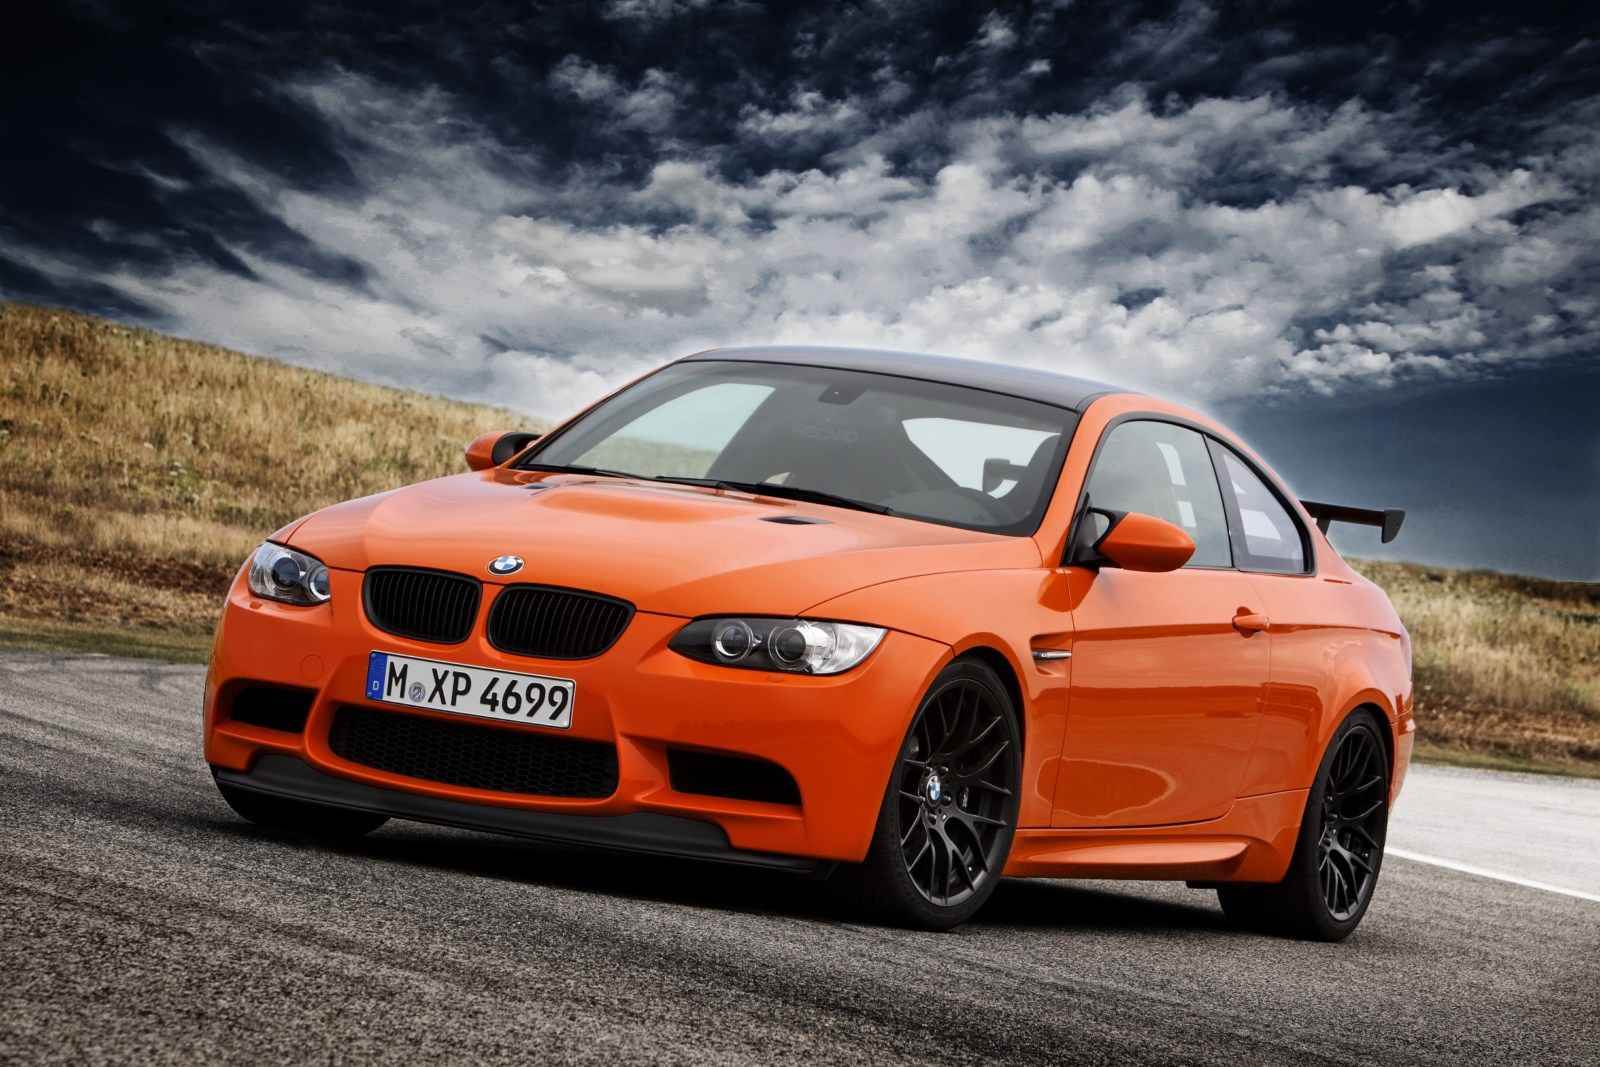 BMW M3 Wallpaper Fullscreen